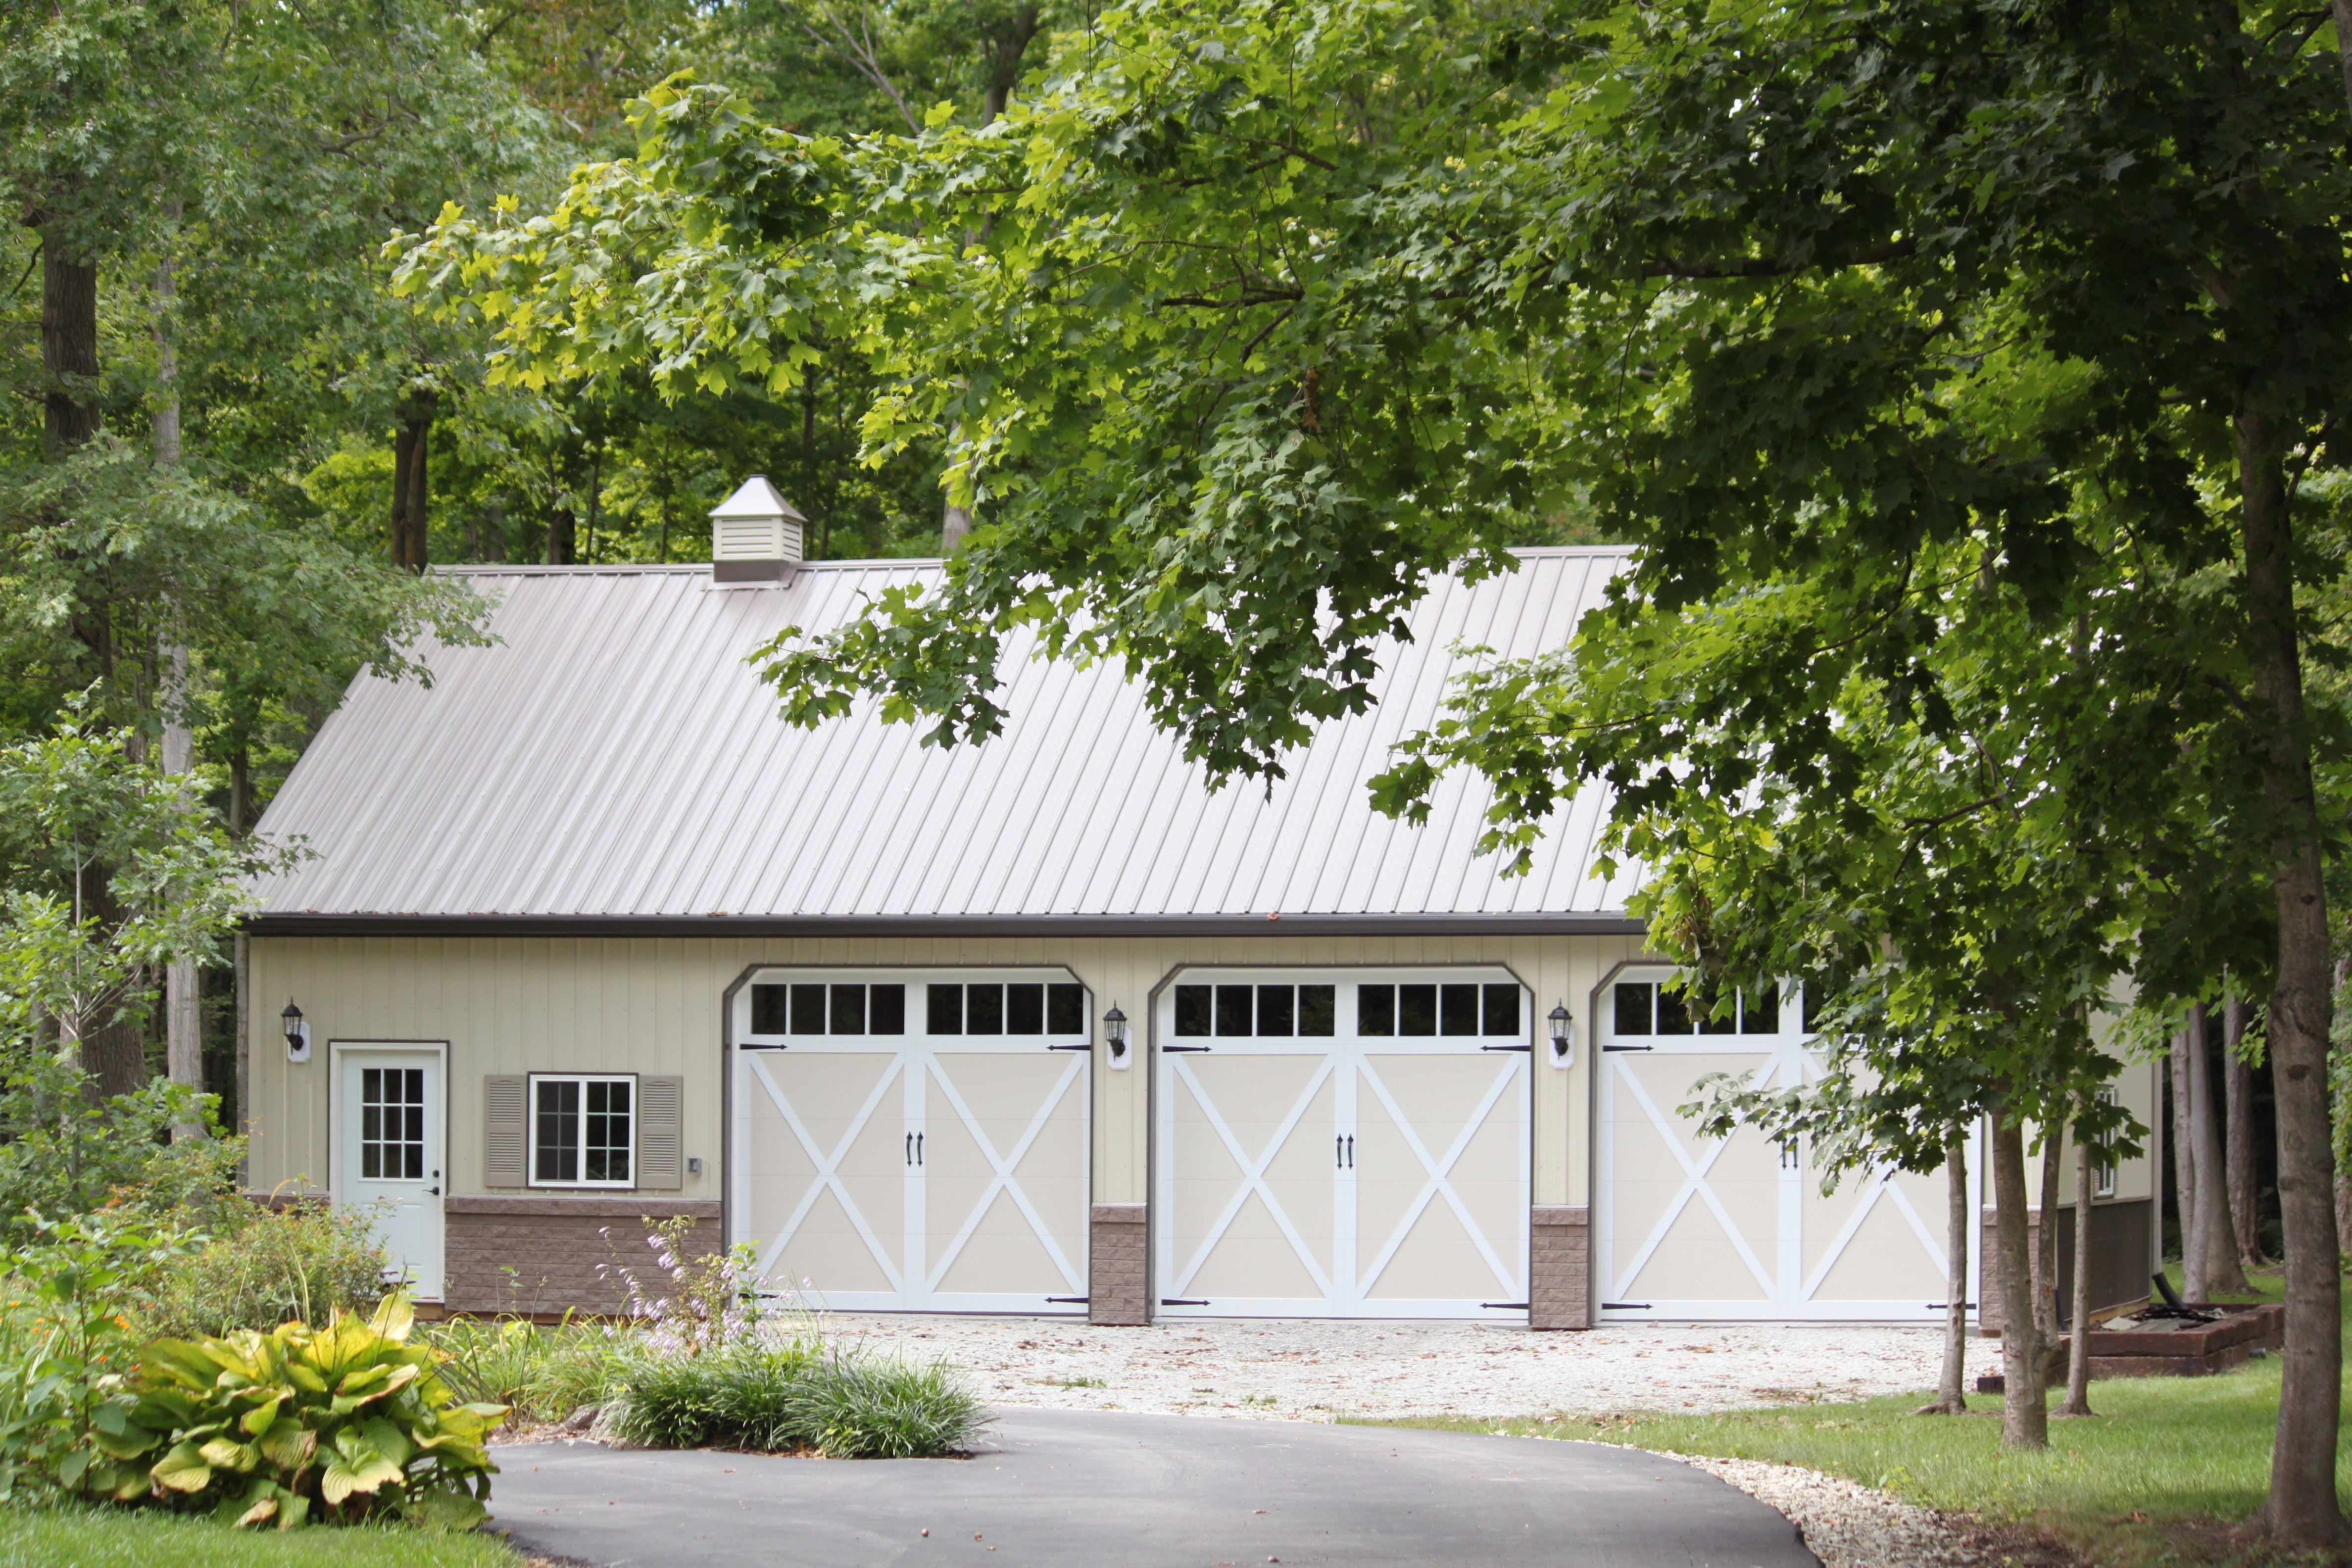 garage doors sioux fallsCarriage house garage doors by CHI Overhead Doors Model 5334A